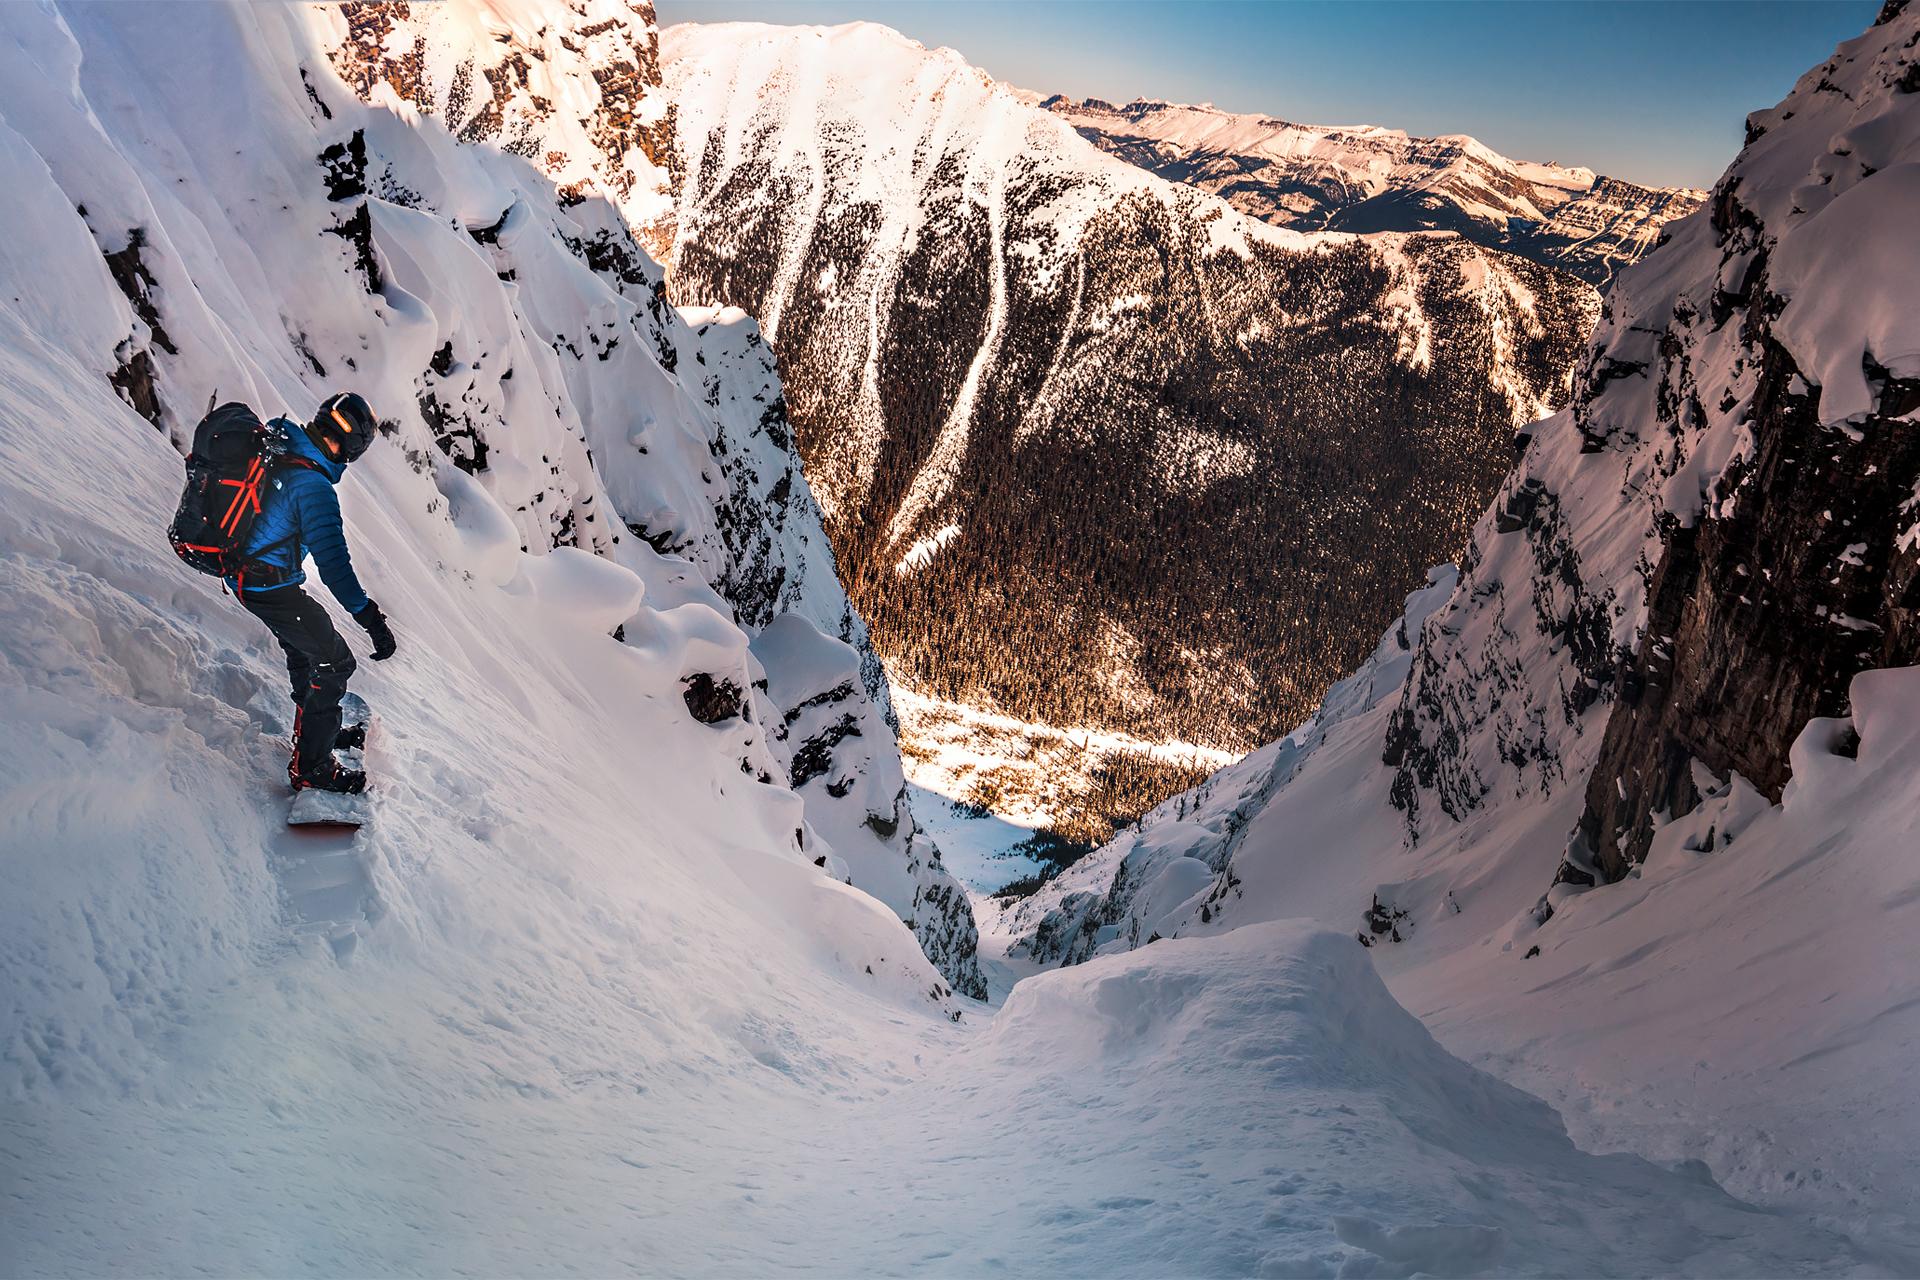 Snowboarding Wallpaper 1920x1280